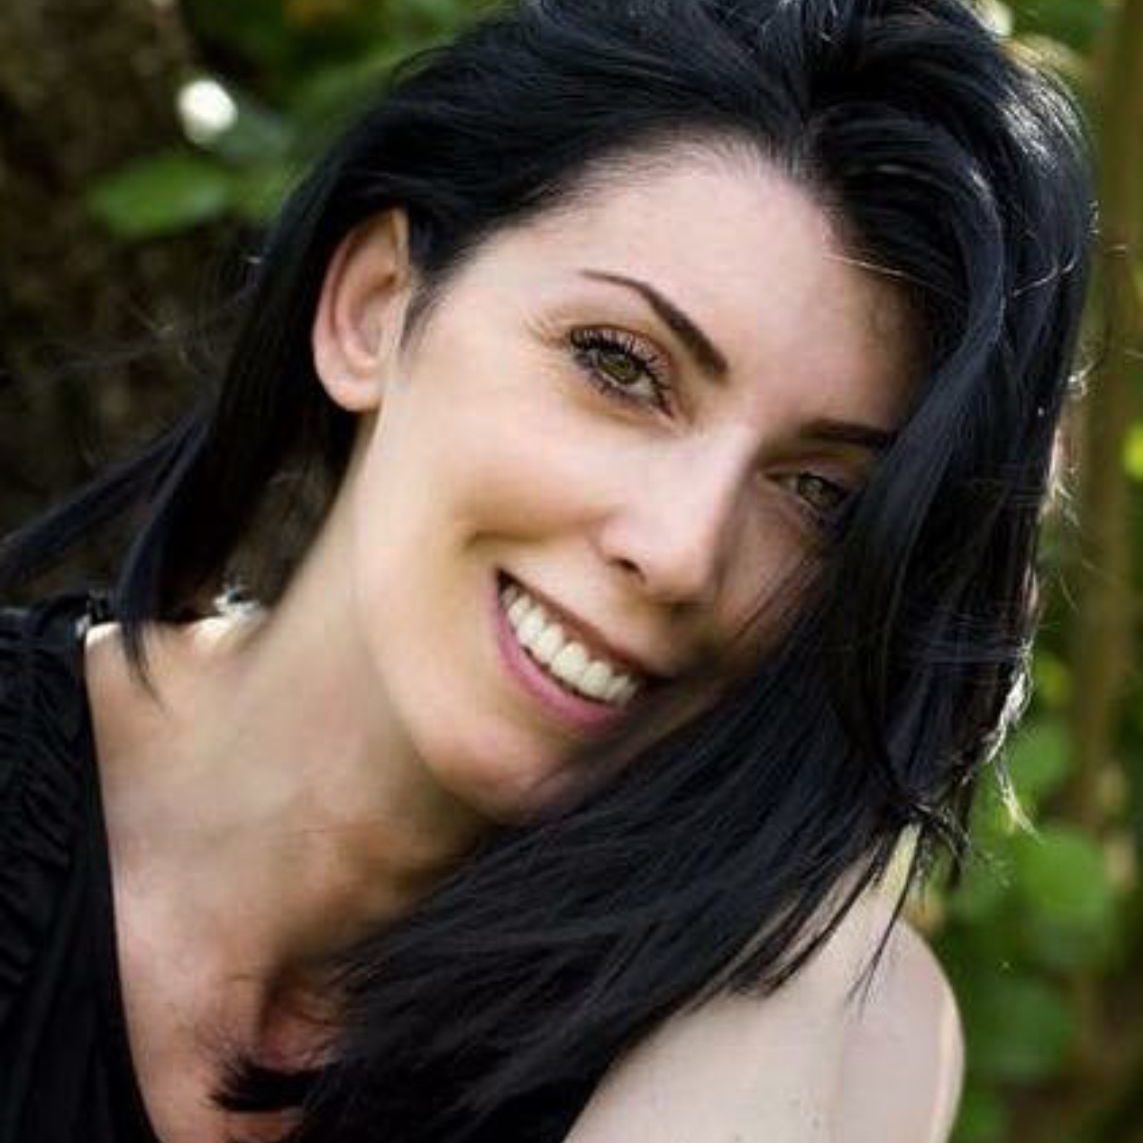 Anita Galafate per Weddinfg planner academy | Italian wedding planner congress